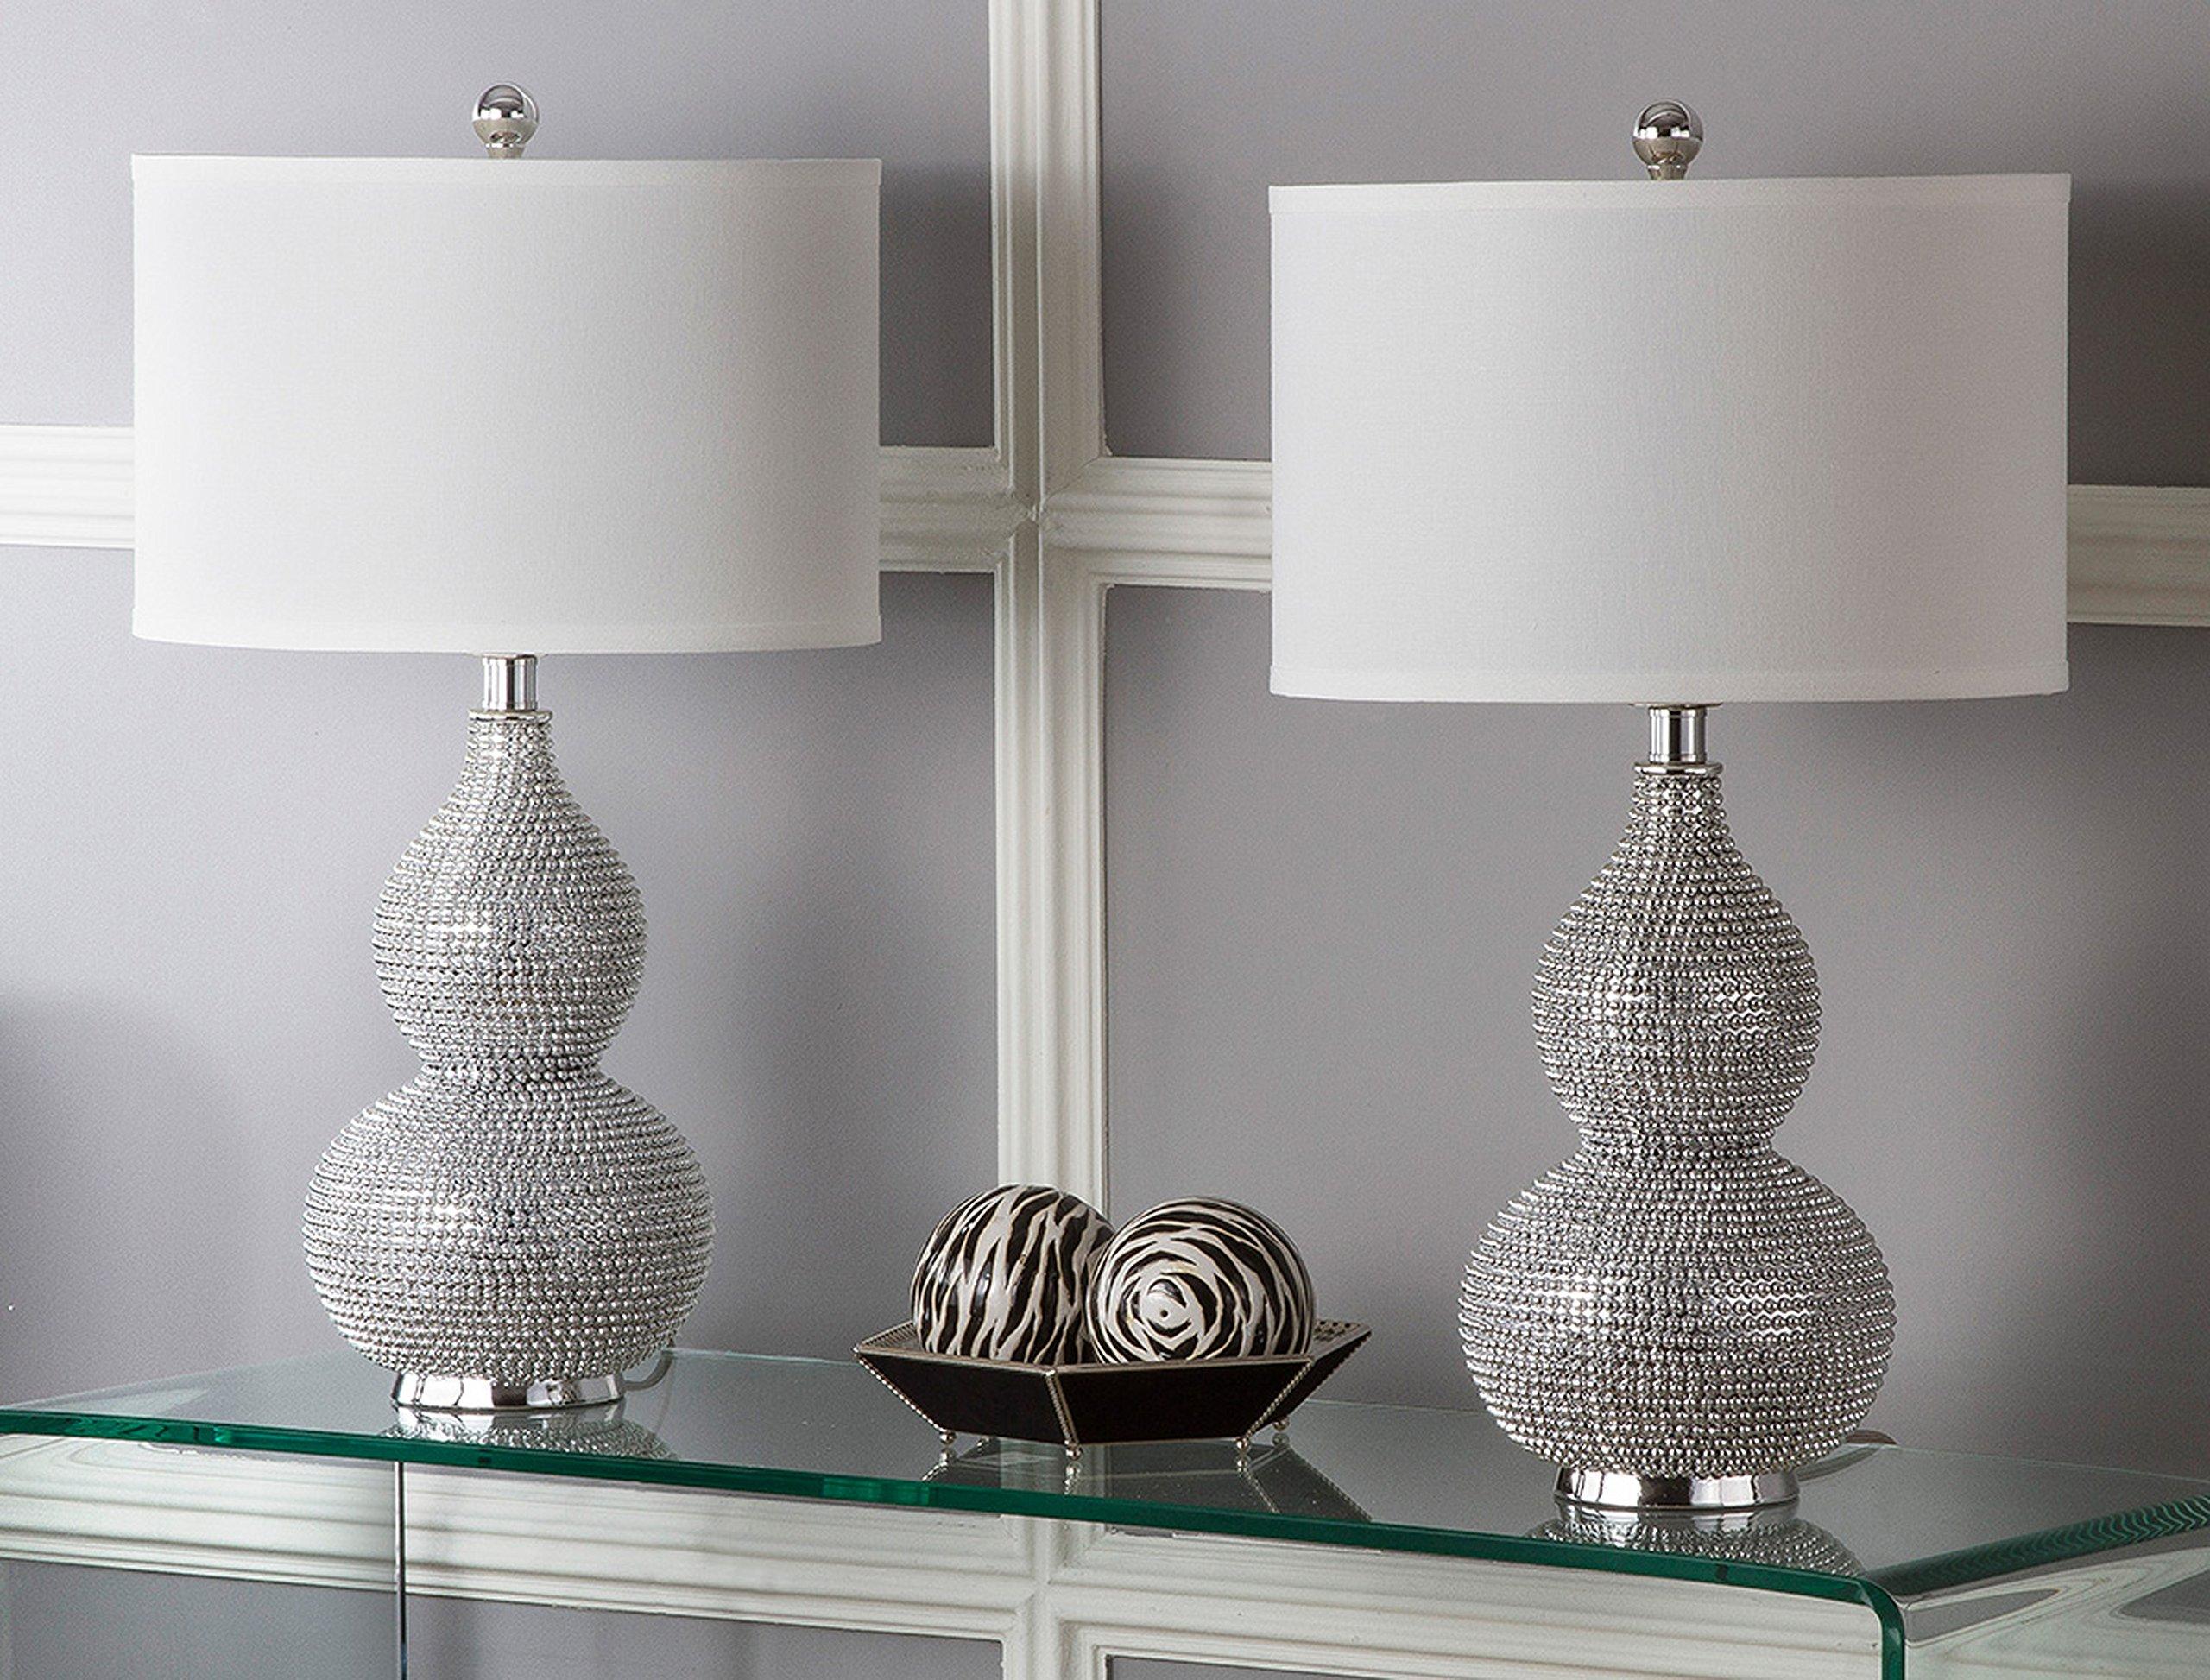 Safavieh Lighting Collection Nicole Bead Base 24-inch Table Lamp (Set of 2) by Safavieh